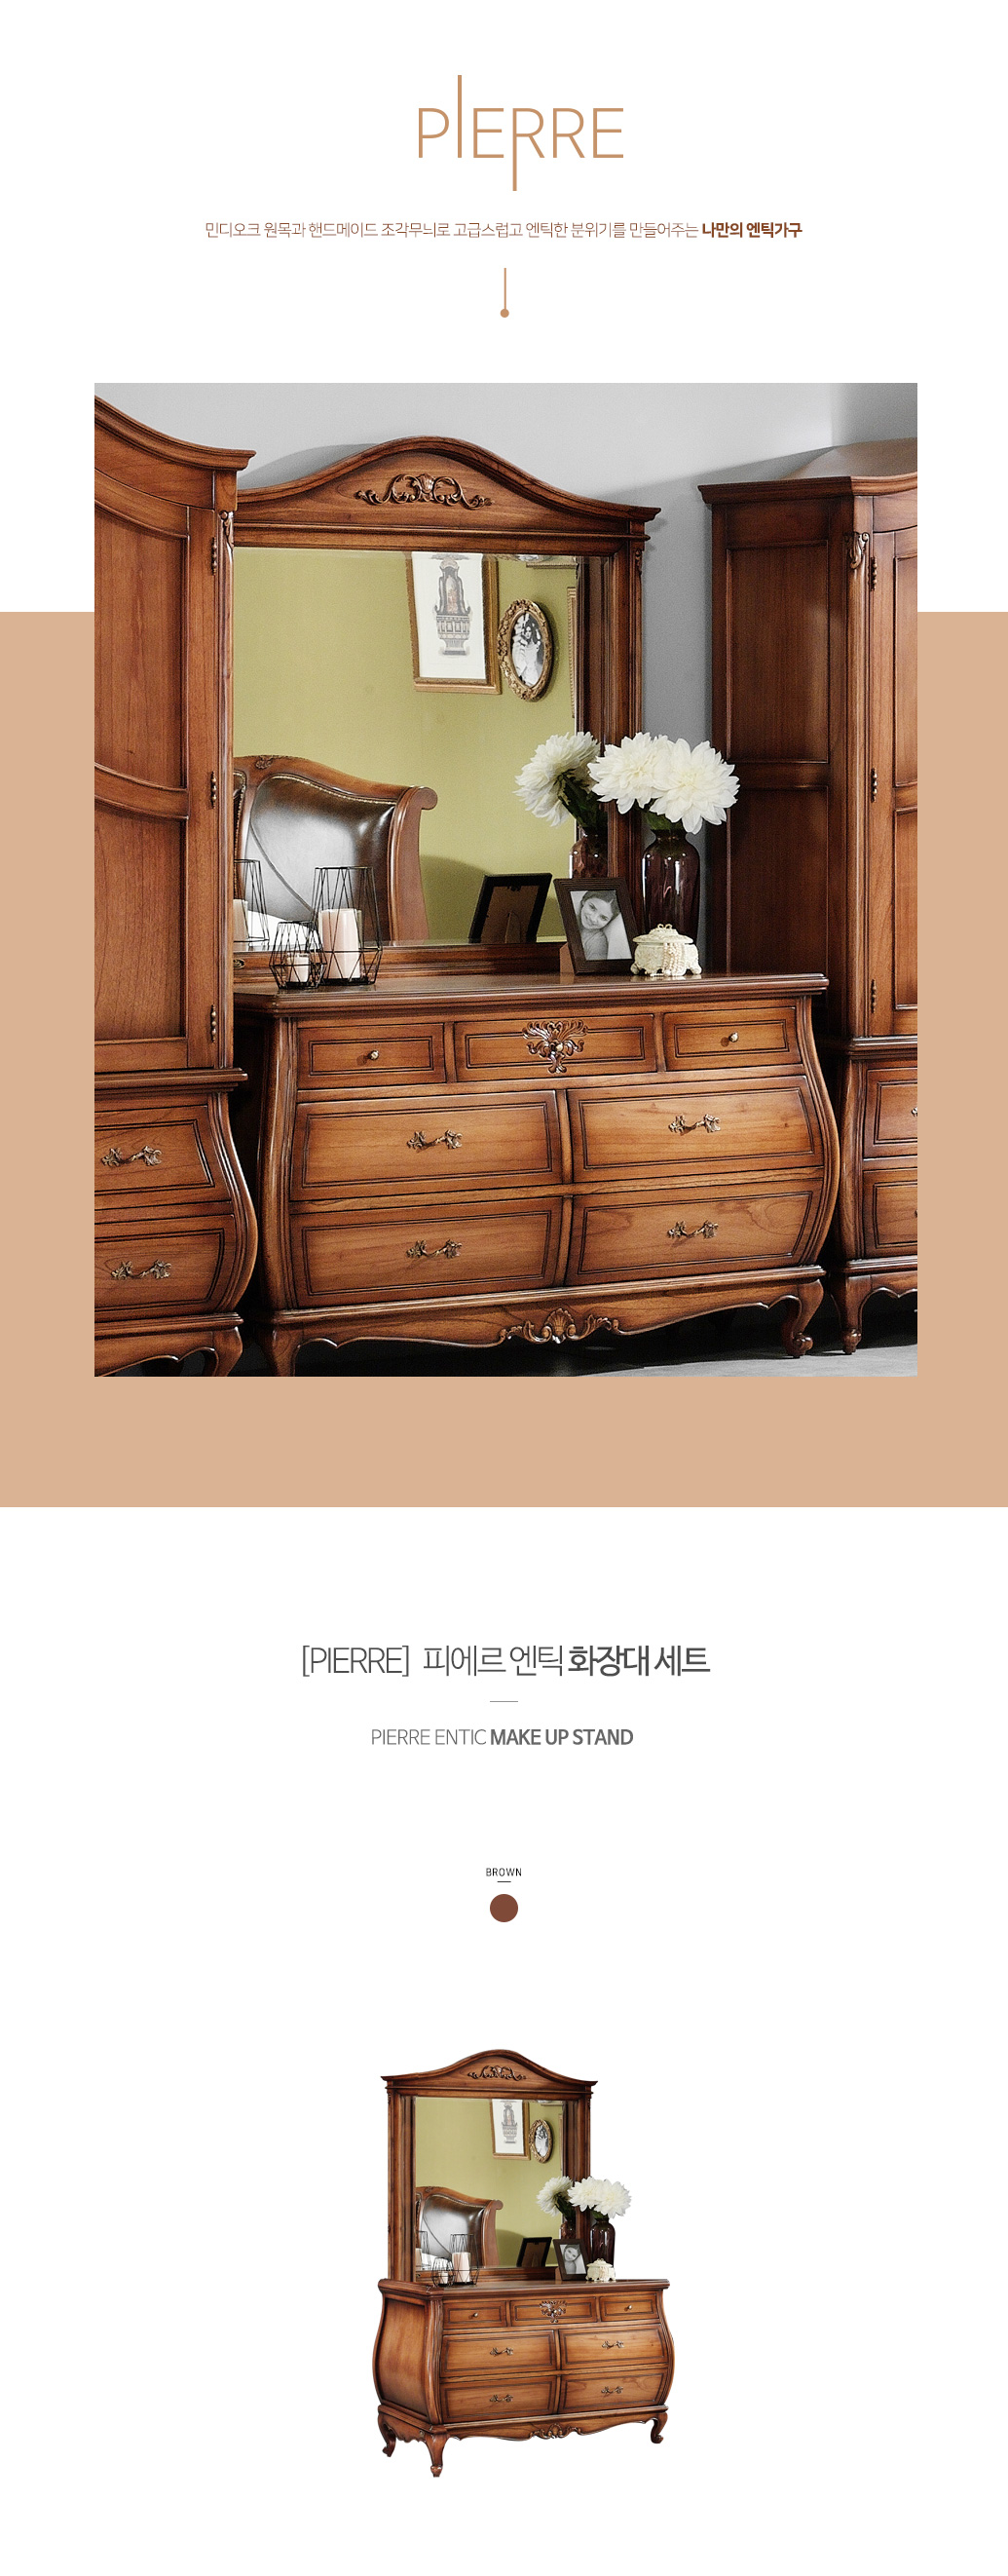 pierre-makeup-stand_01.jpg